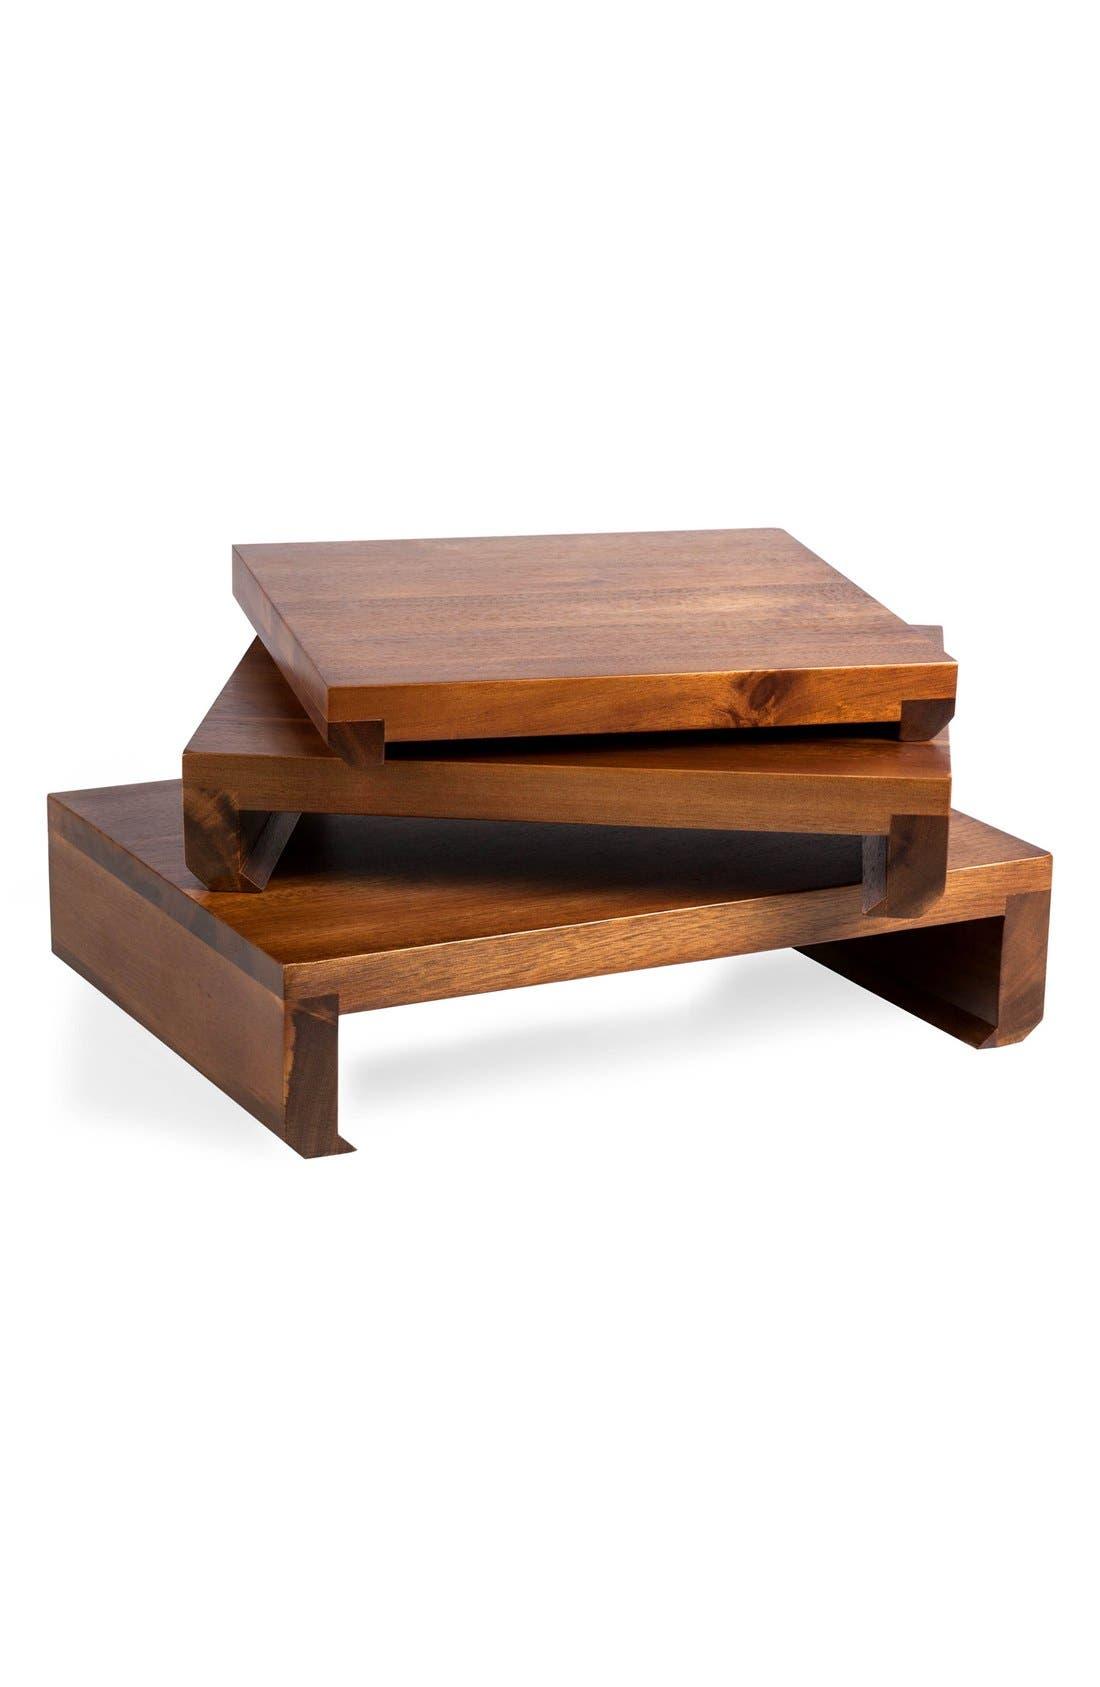 'Etage' Wood Serving Pedestals,                             Main thumbnail 1, color,                             BROWN